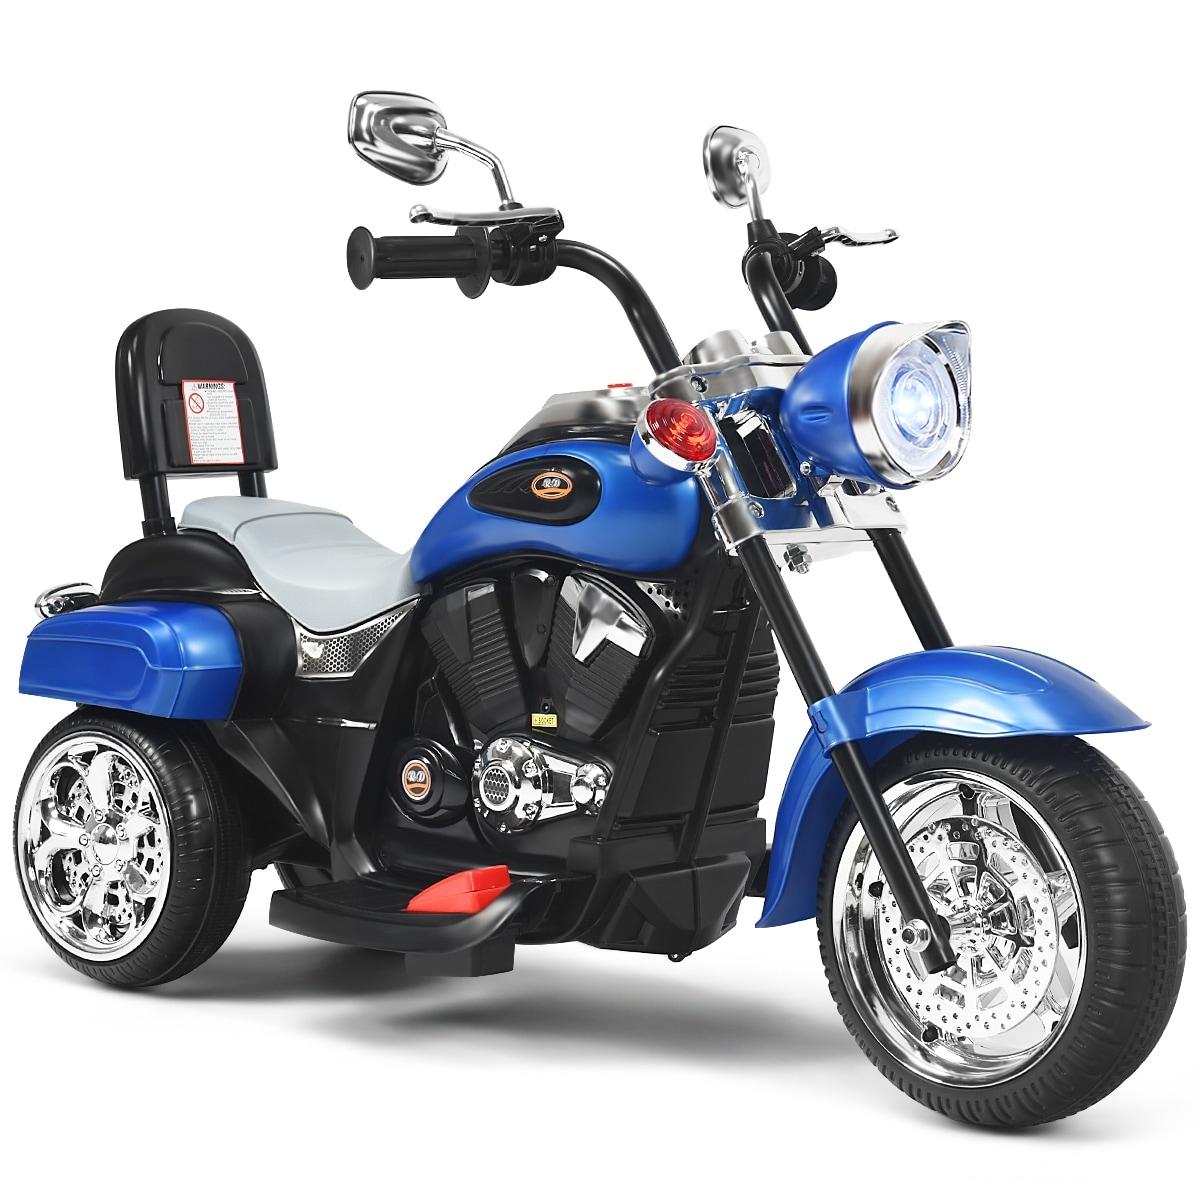 Kids Motorcycle Ride On 6 V 3 Wheels Kids Ride on Motorcycle